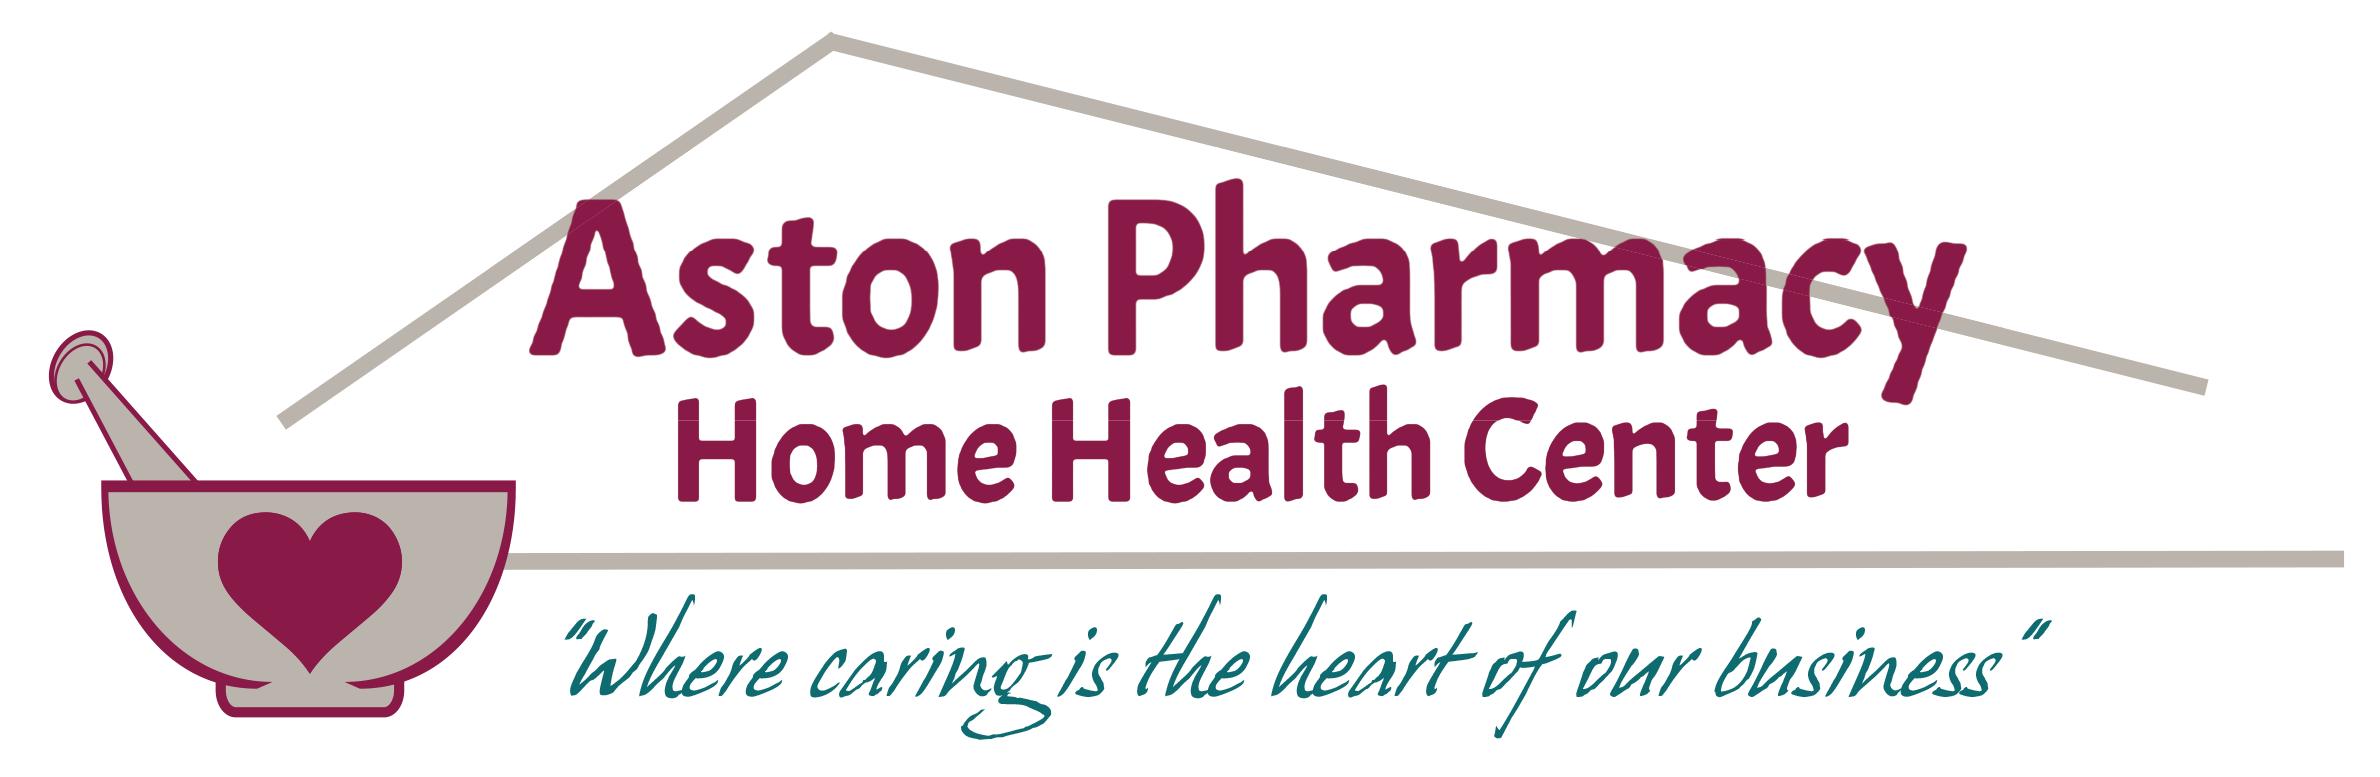 Aston Pharmacy Home Health Center